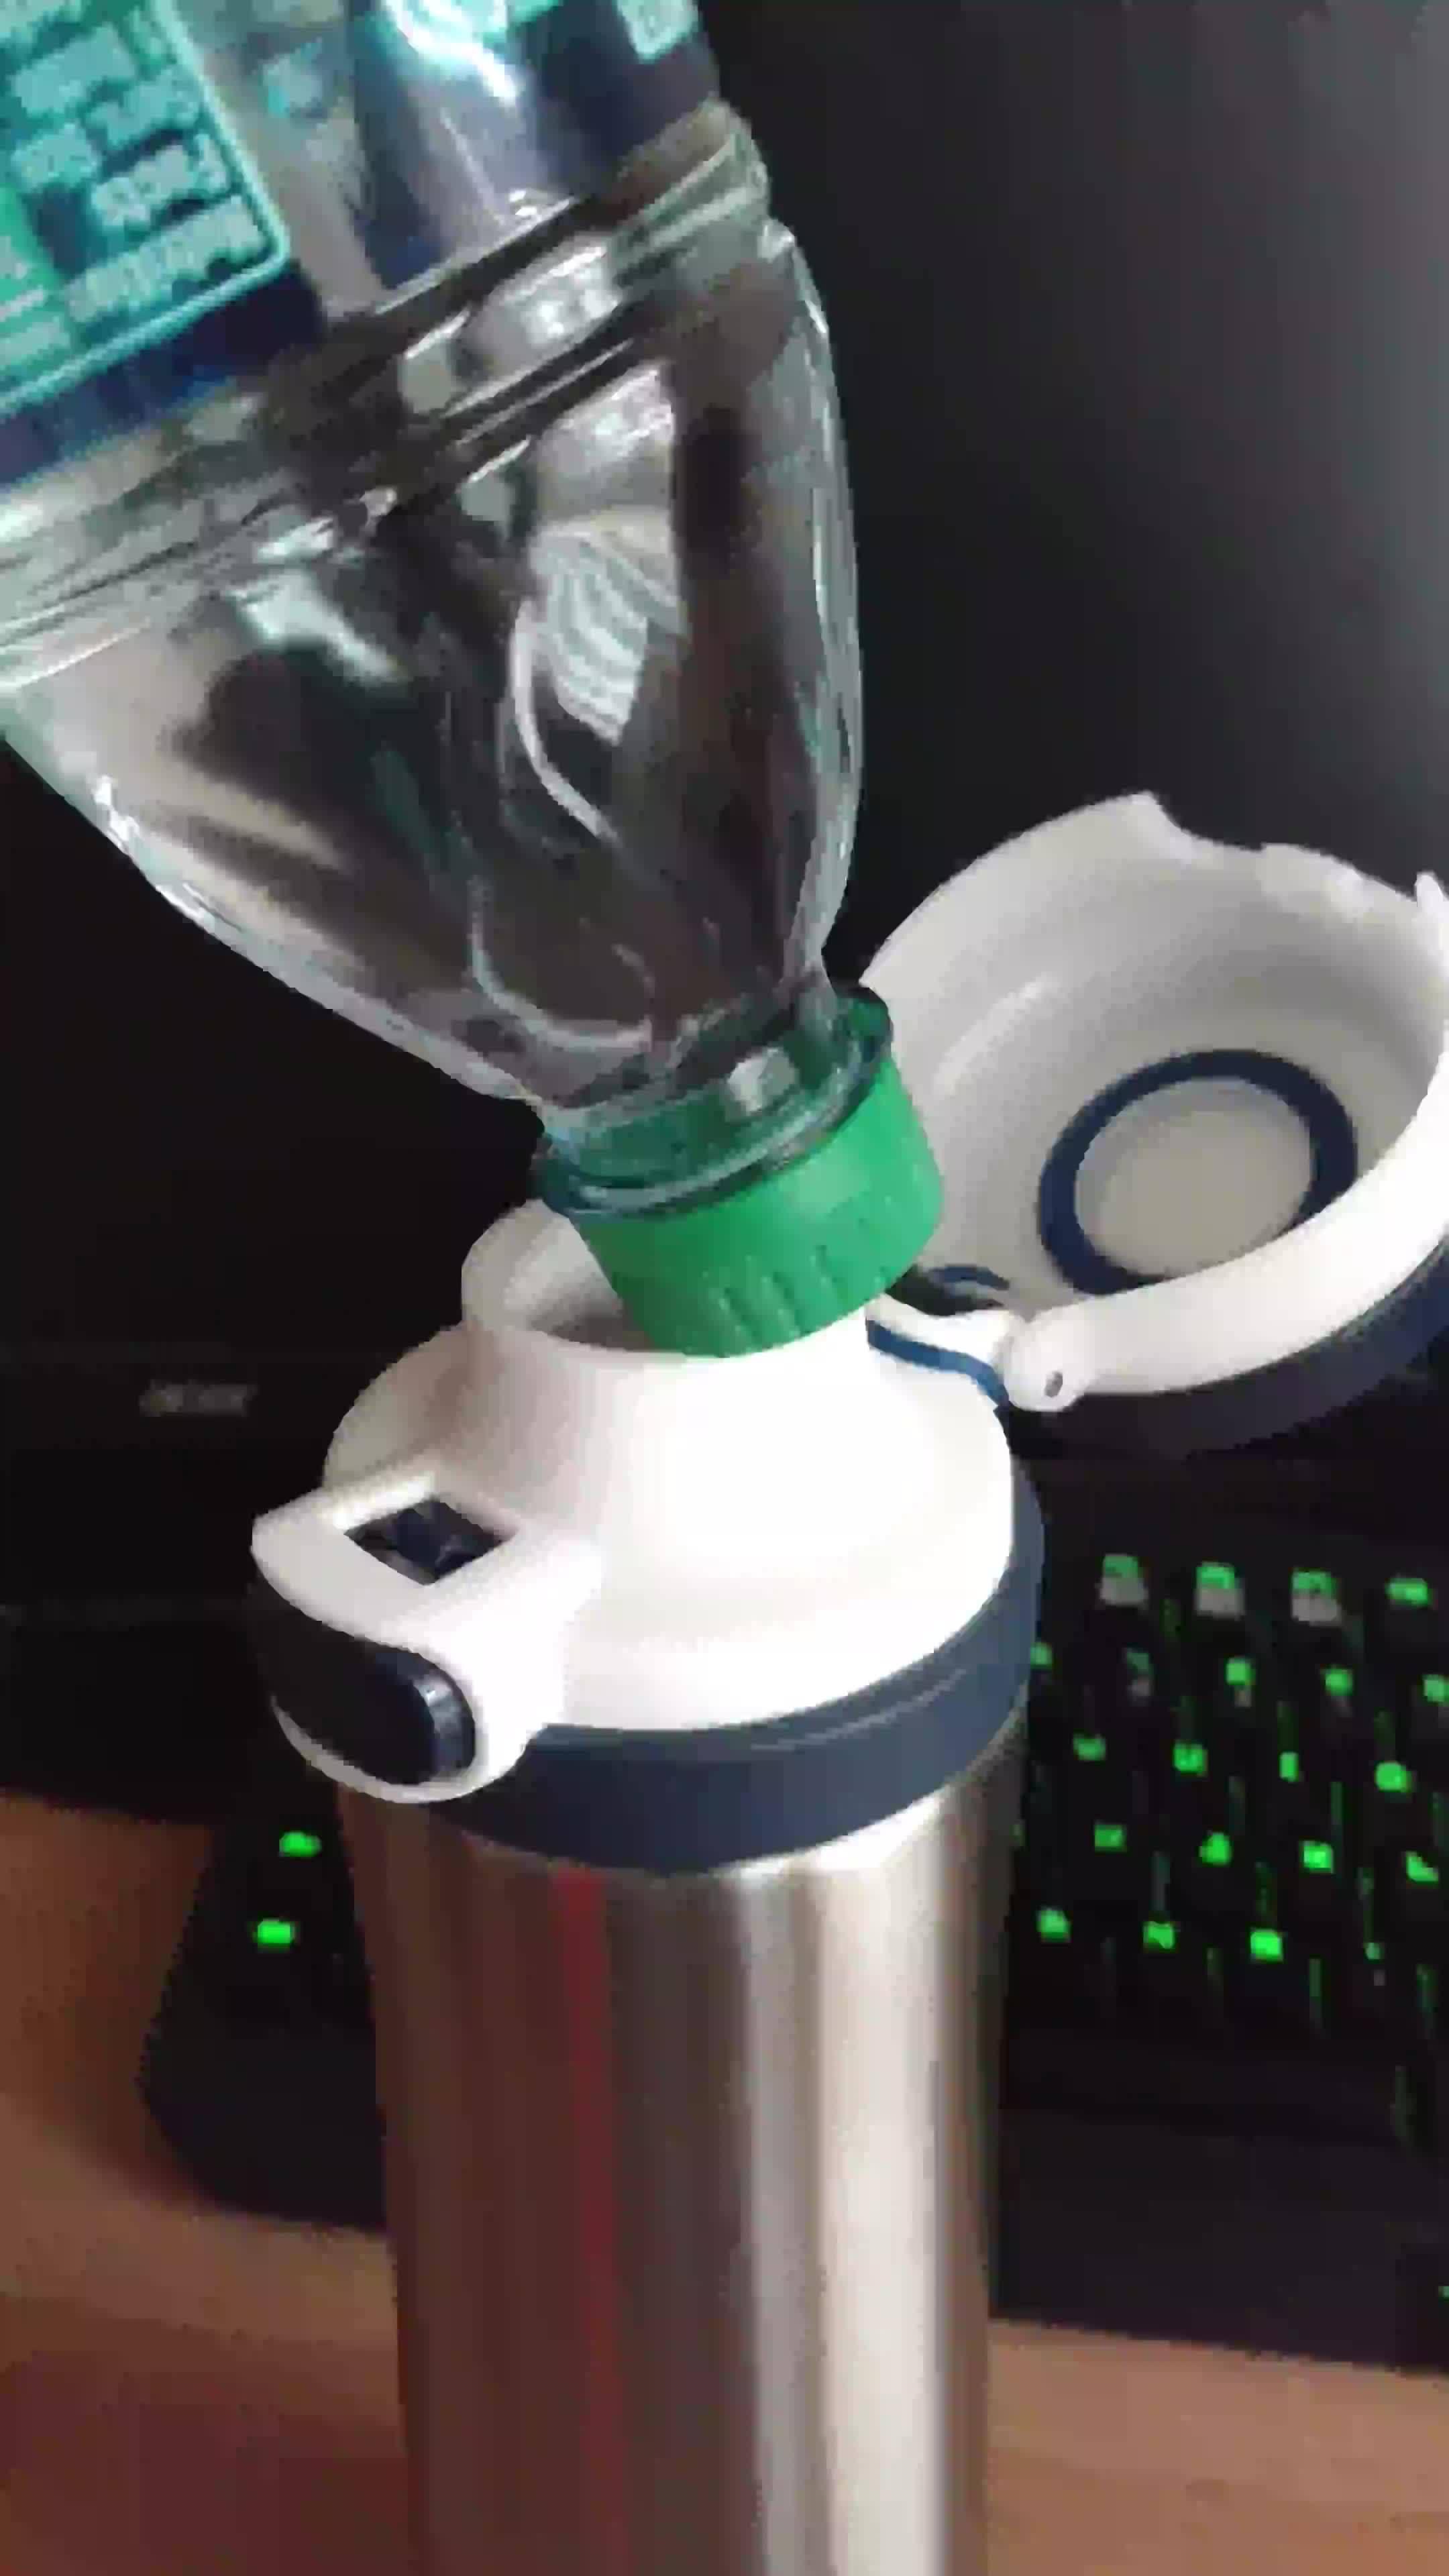 perfectfit, Water bottles GIFs